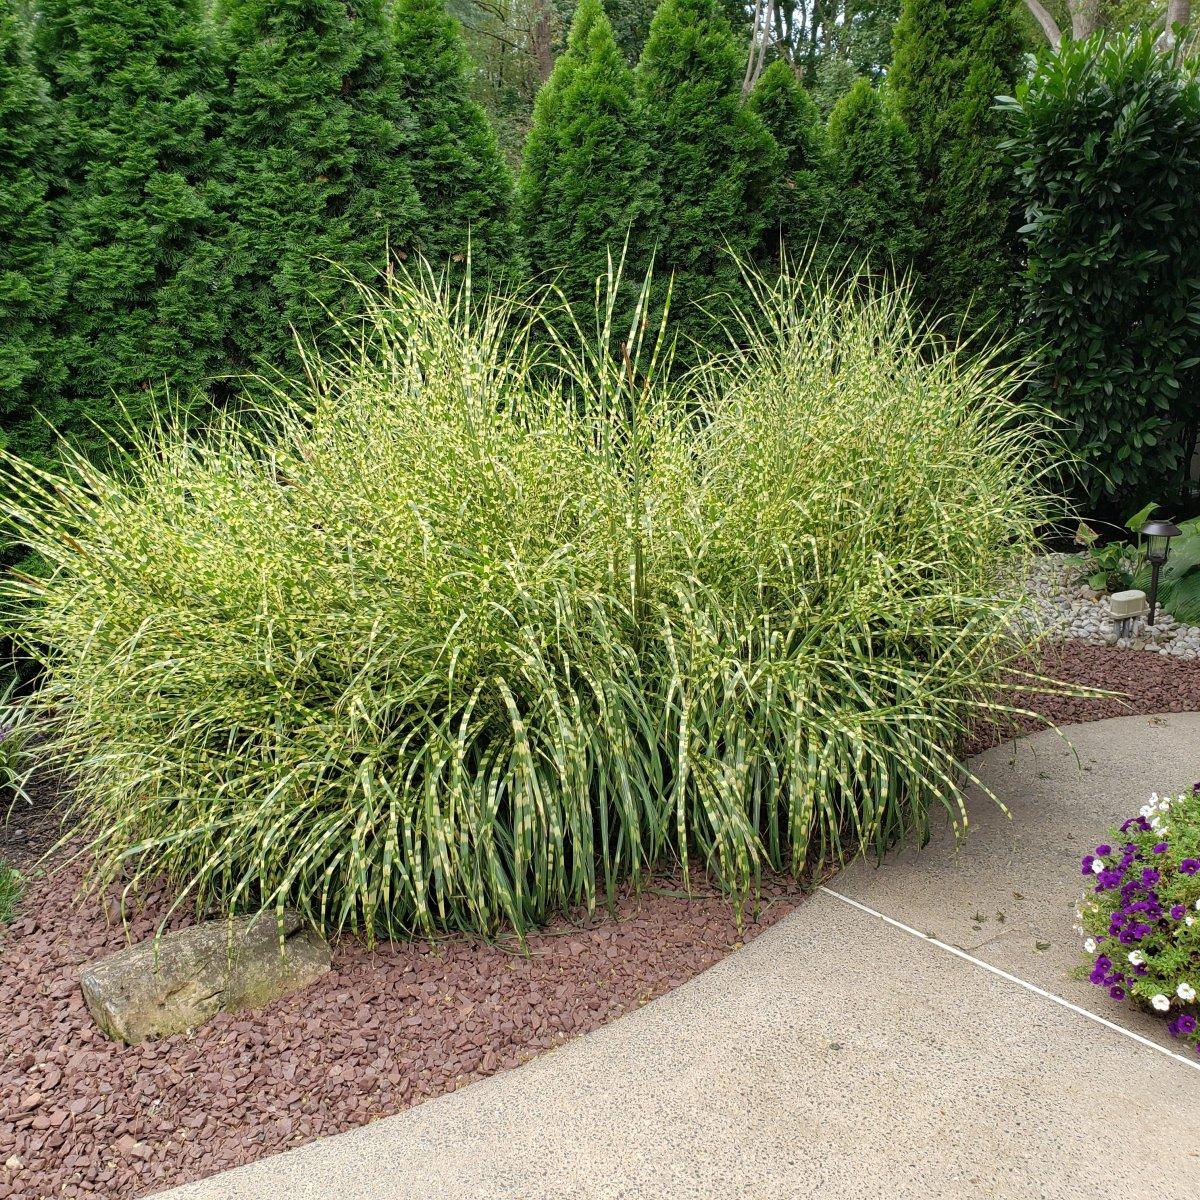 Zebra grass growing in my friend's yard.